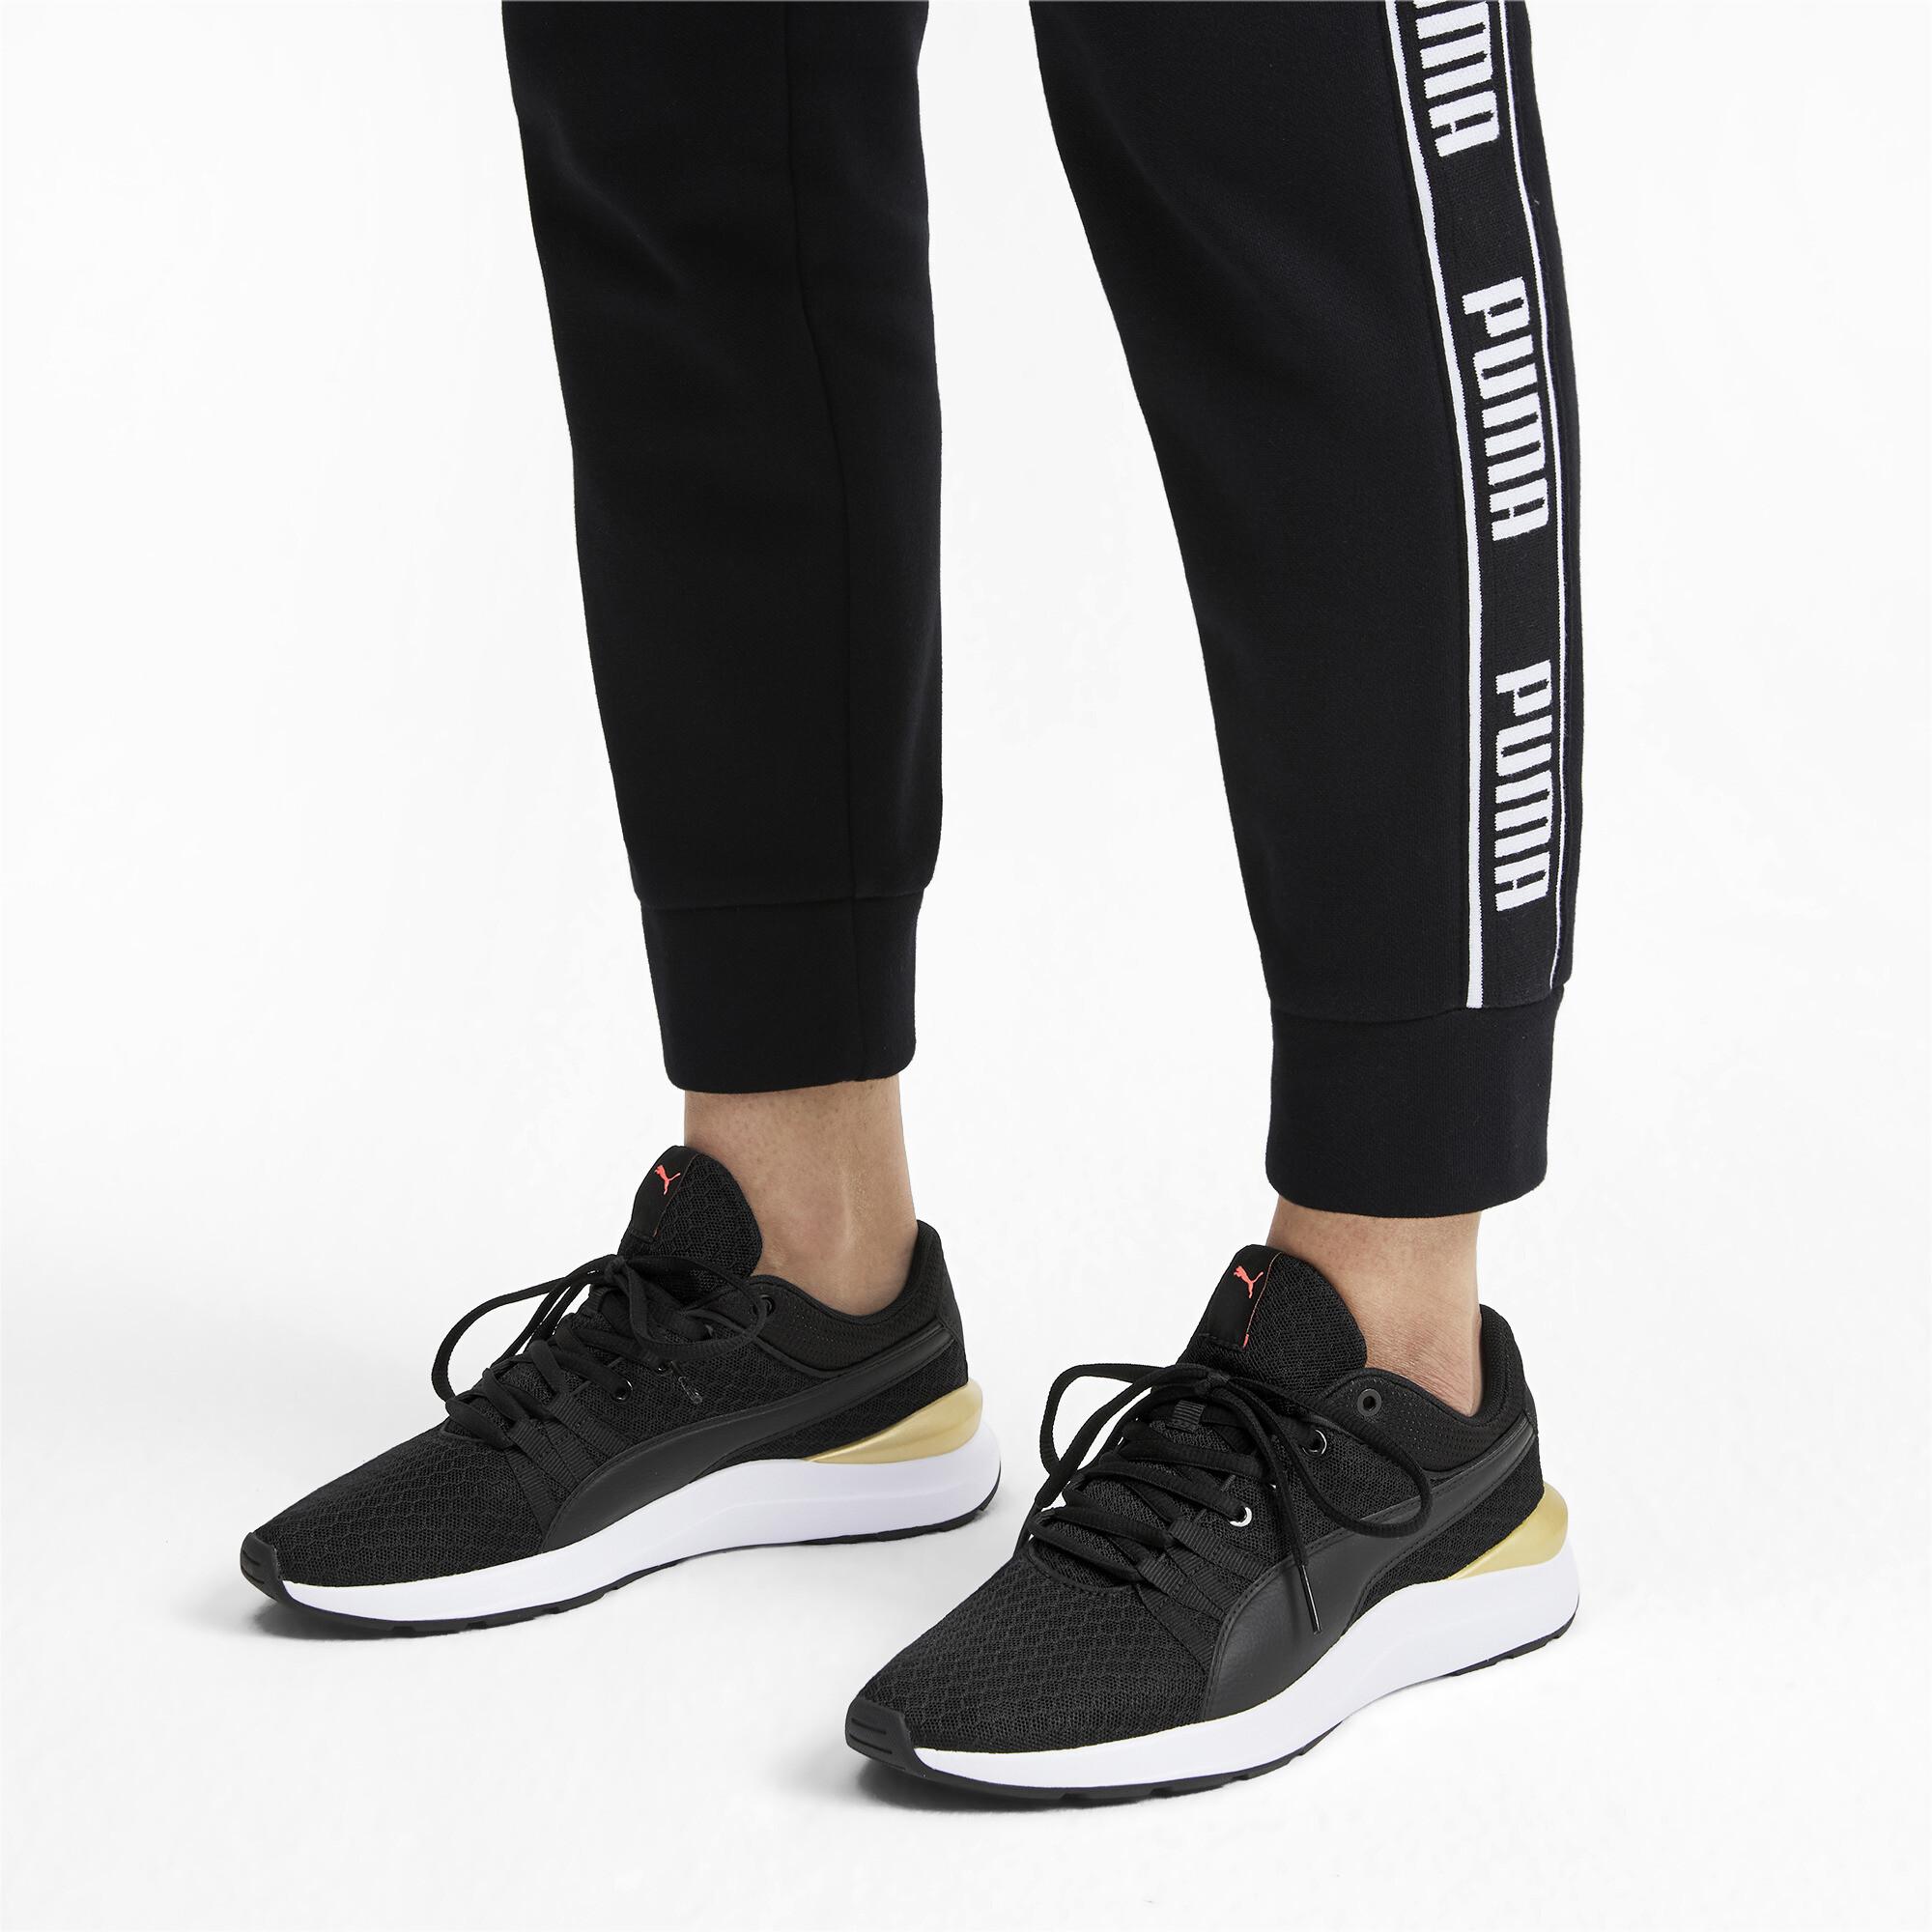 PUMA-Adela-Core-Women-s-Sneakers-Women-Shoe-Basics thumbnail 5